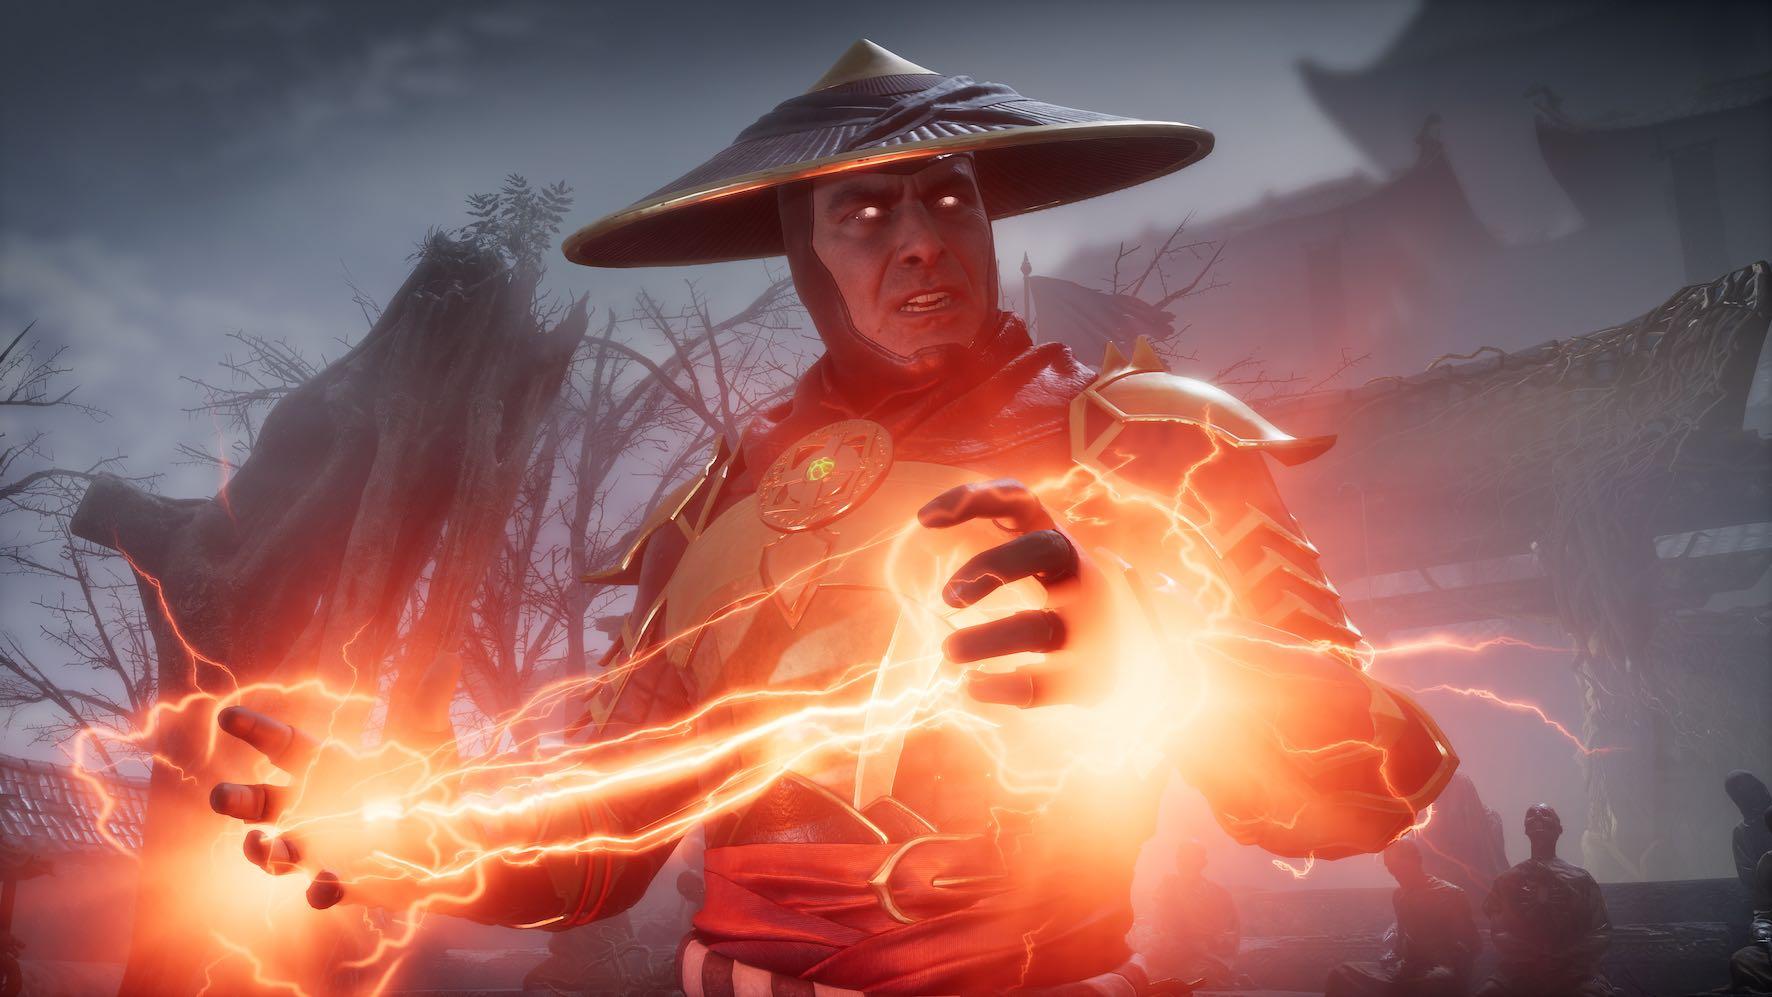 Raiden featured in Mortal Kombat 11